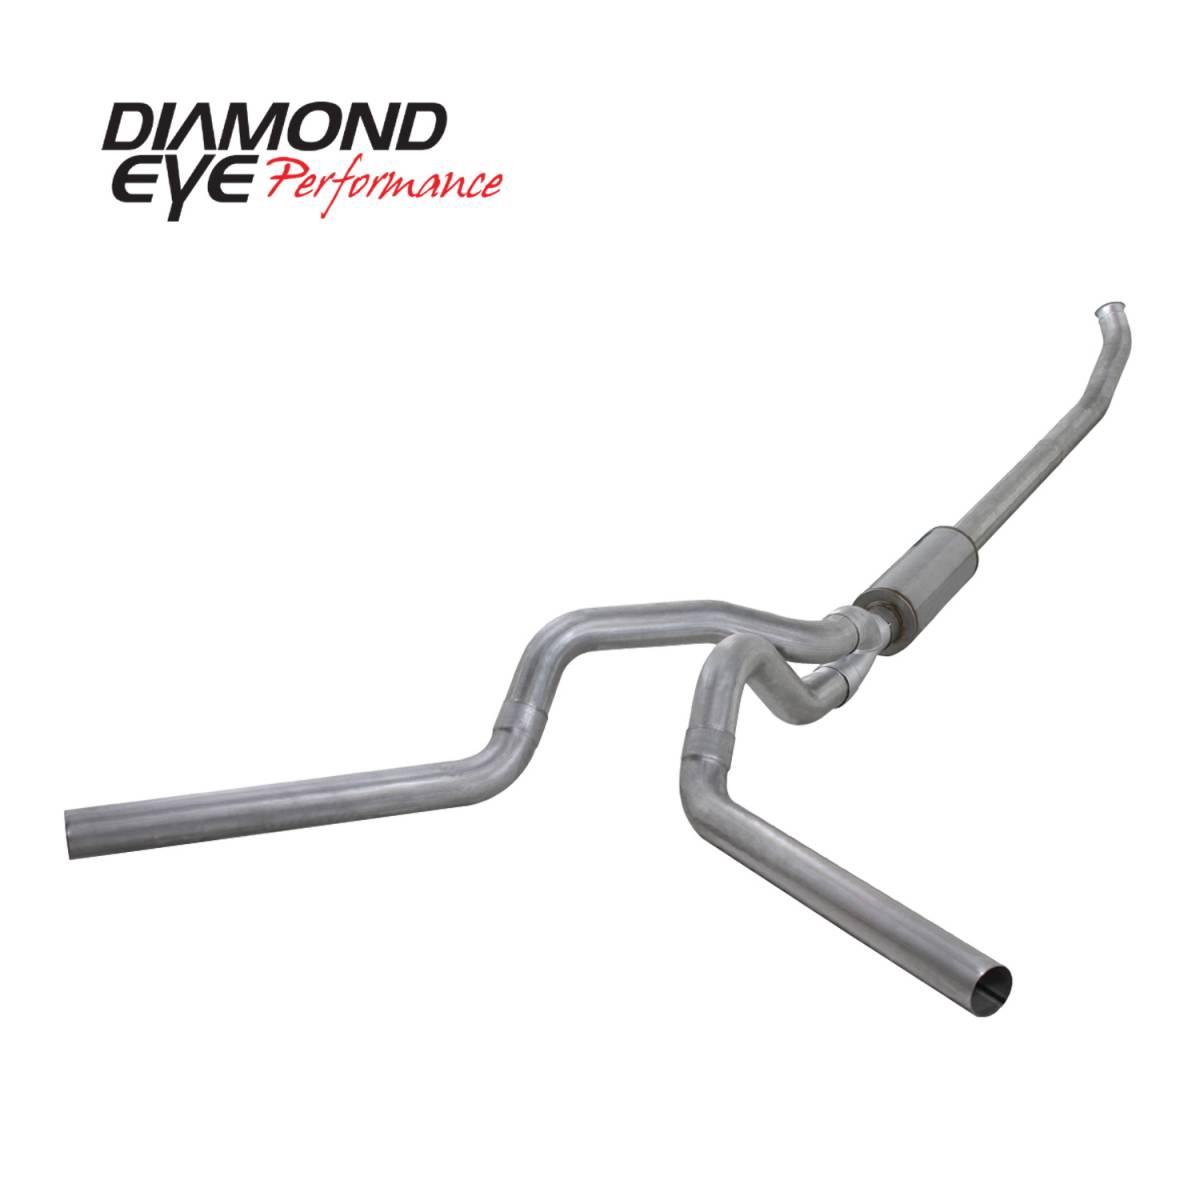 Diamond Eye Performance K A 5 Dodge 5 9l